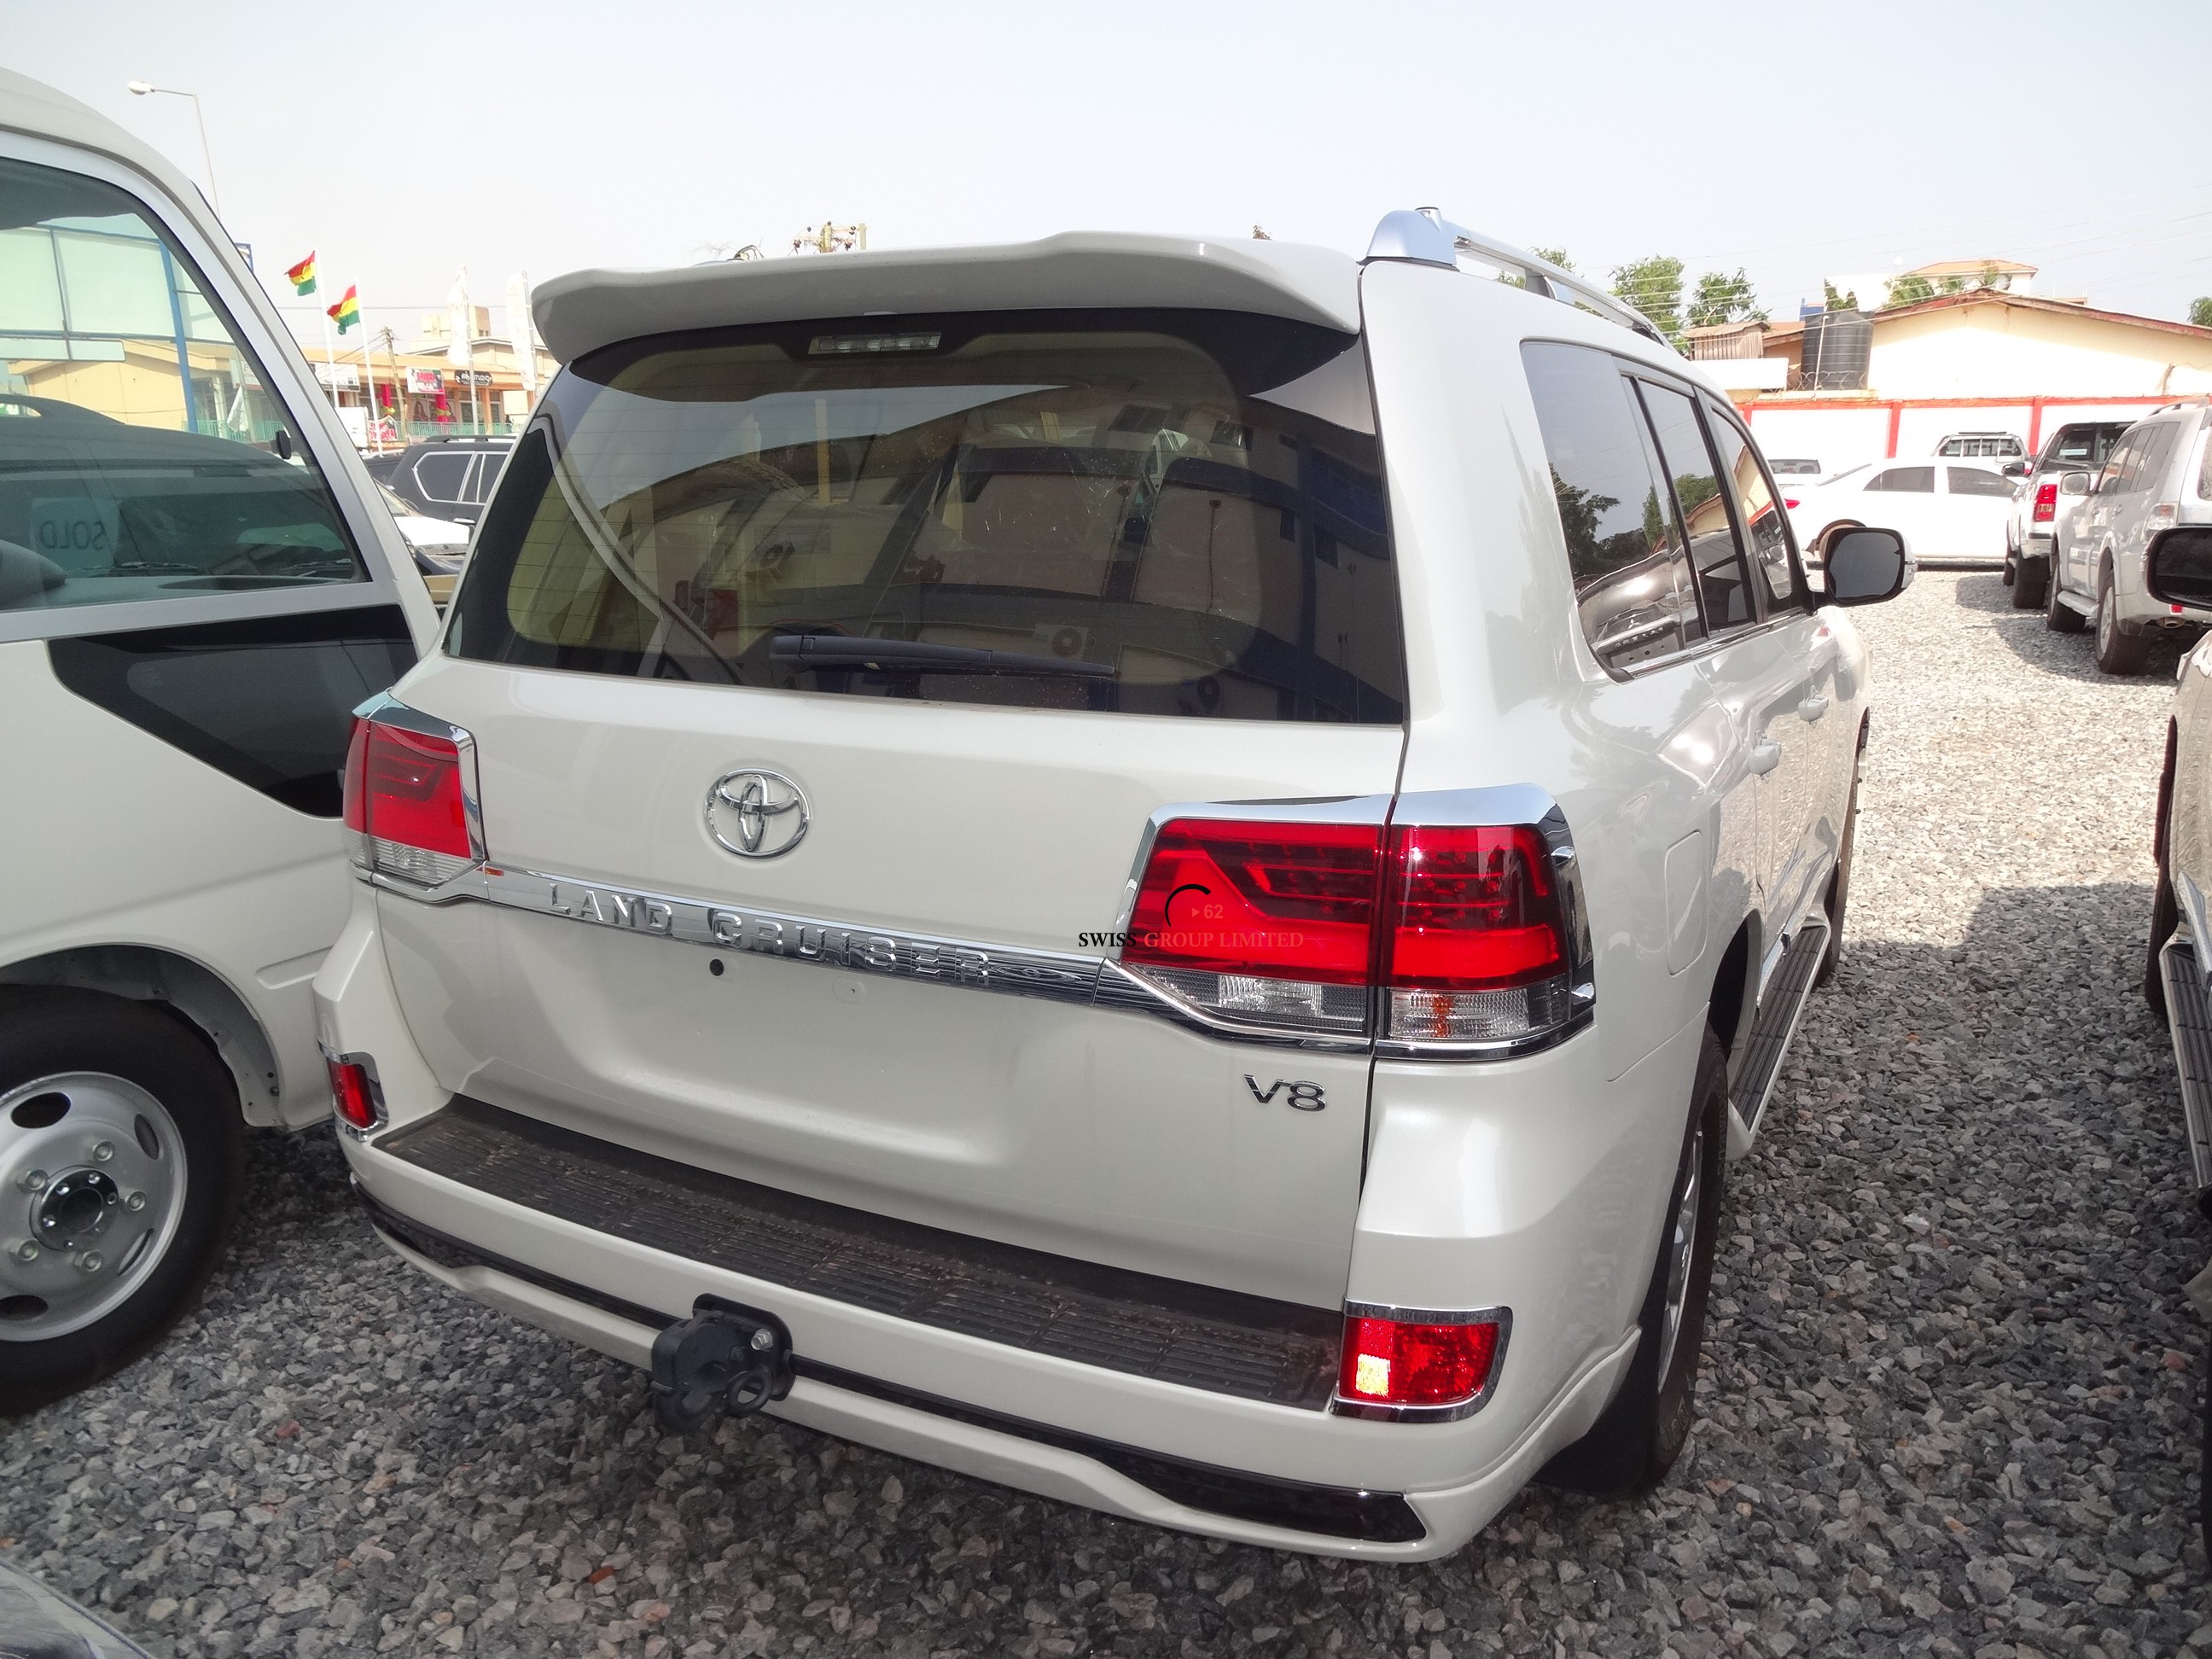 Toyota Land Cruiser V8 White Swiss Group Limited